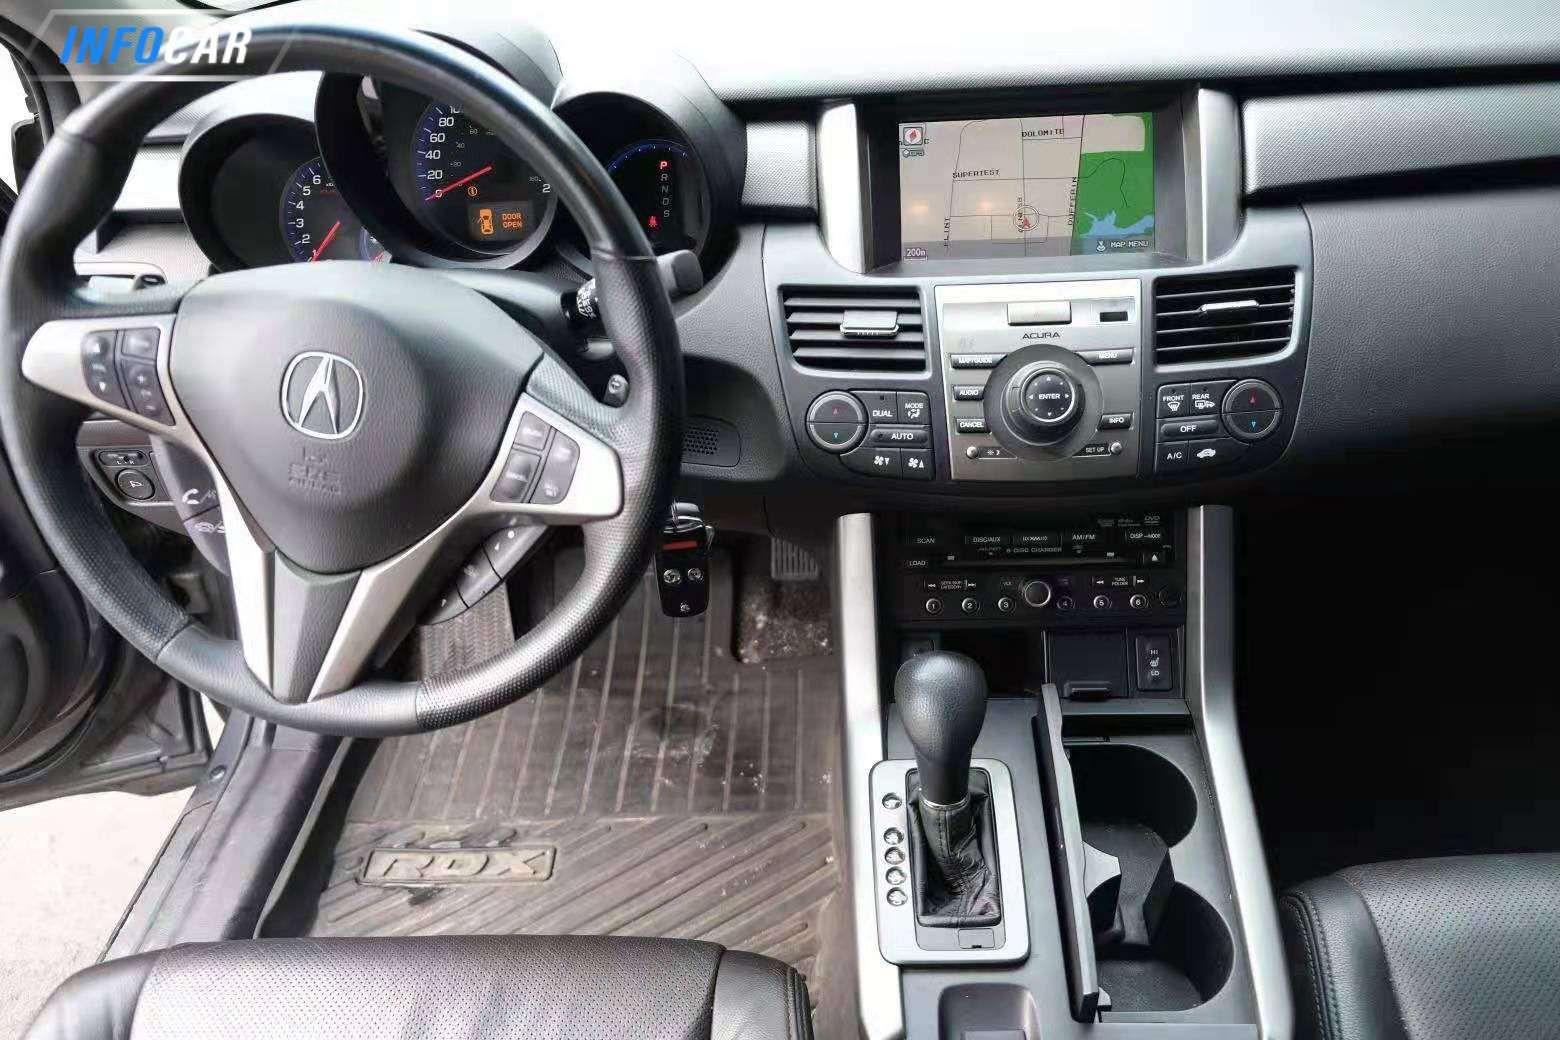 2011 Acura RDX RDX TECHNOLOGY - INFOCAR - Toronto's Most Comprehensive New and Used Auto Trading Platform